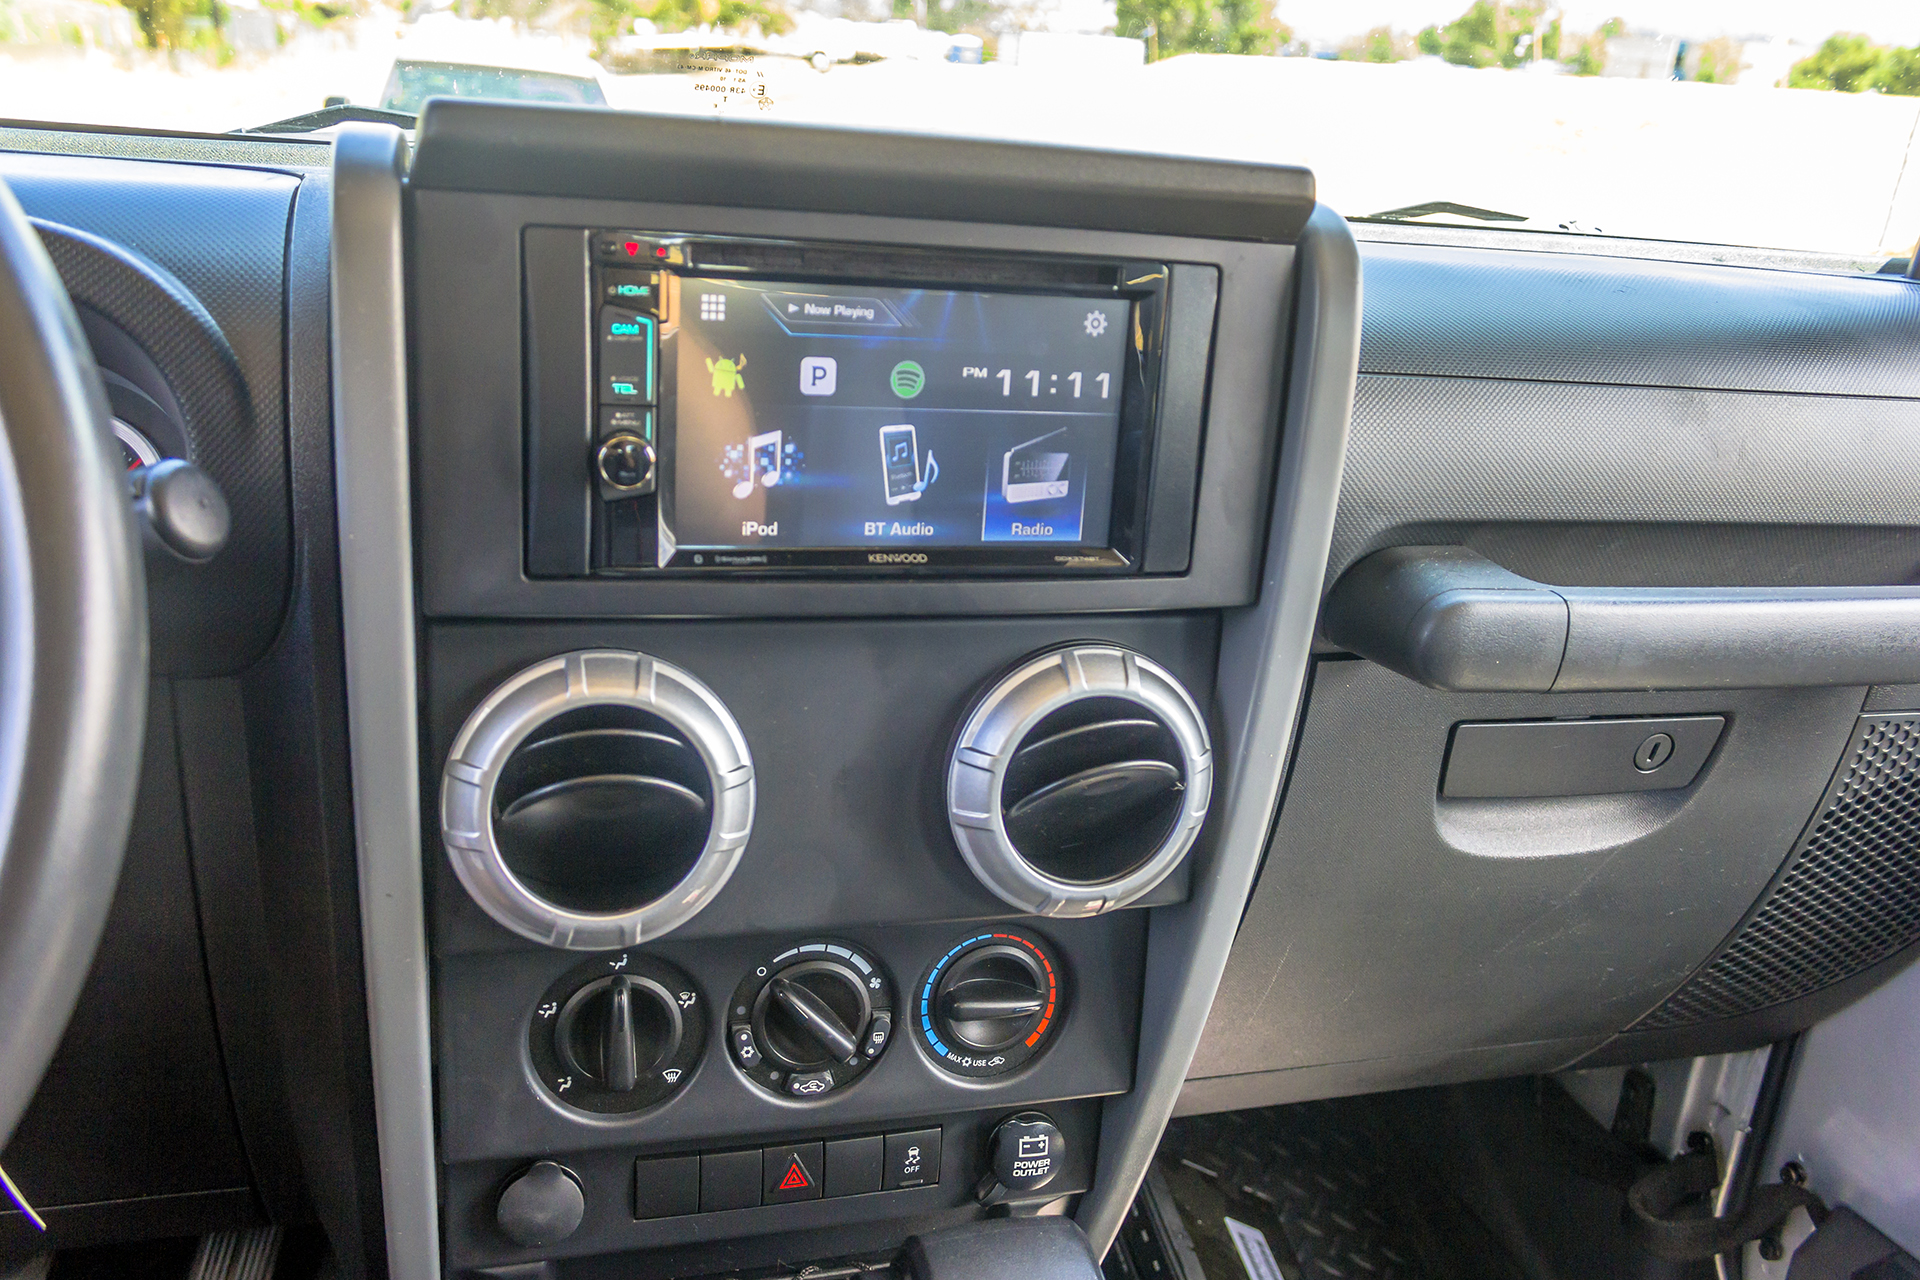 2010+Jeep+Wrangler+DDIN?format=1500w 2010 jeep wrangler ddin install twelve volt technologies 2010 jeep wrangler radio wiring harness at webbmarketing.co